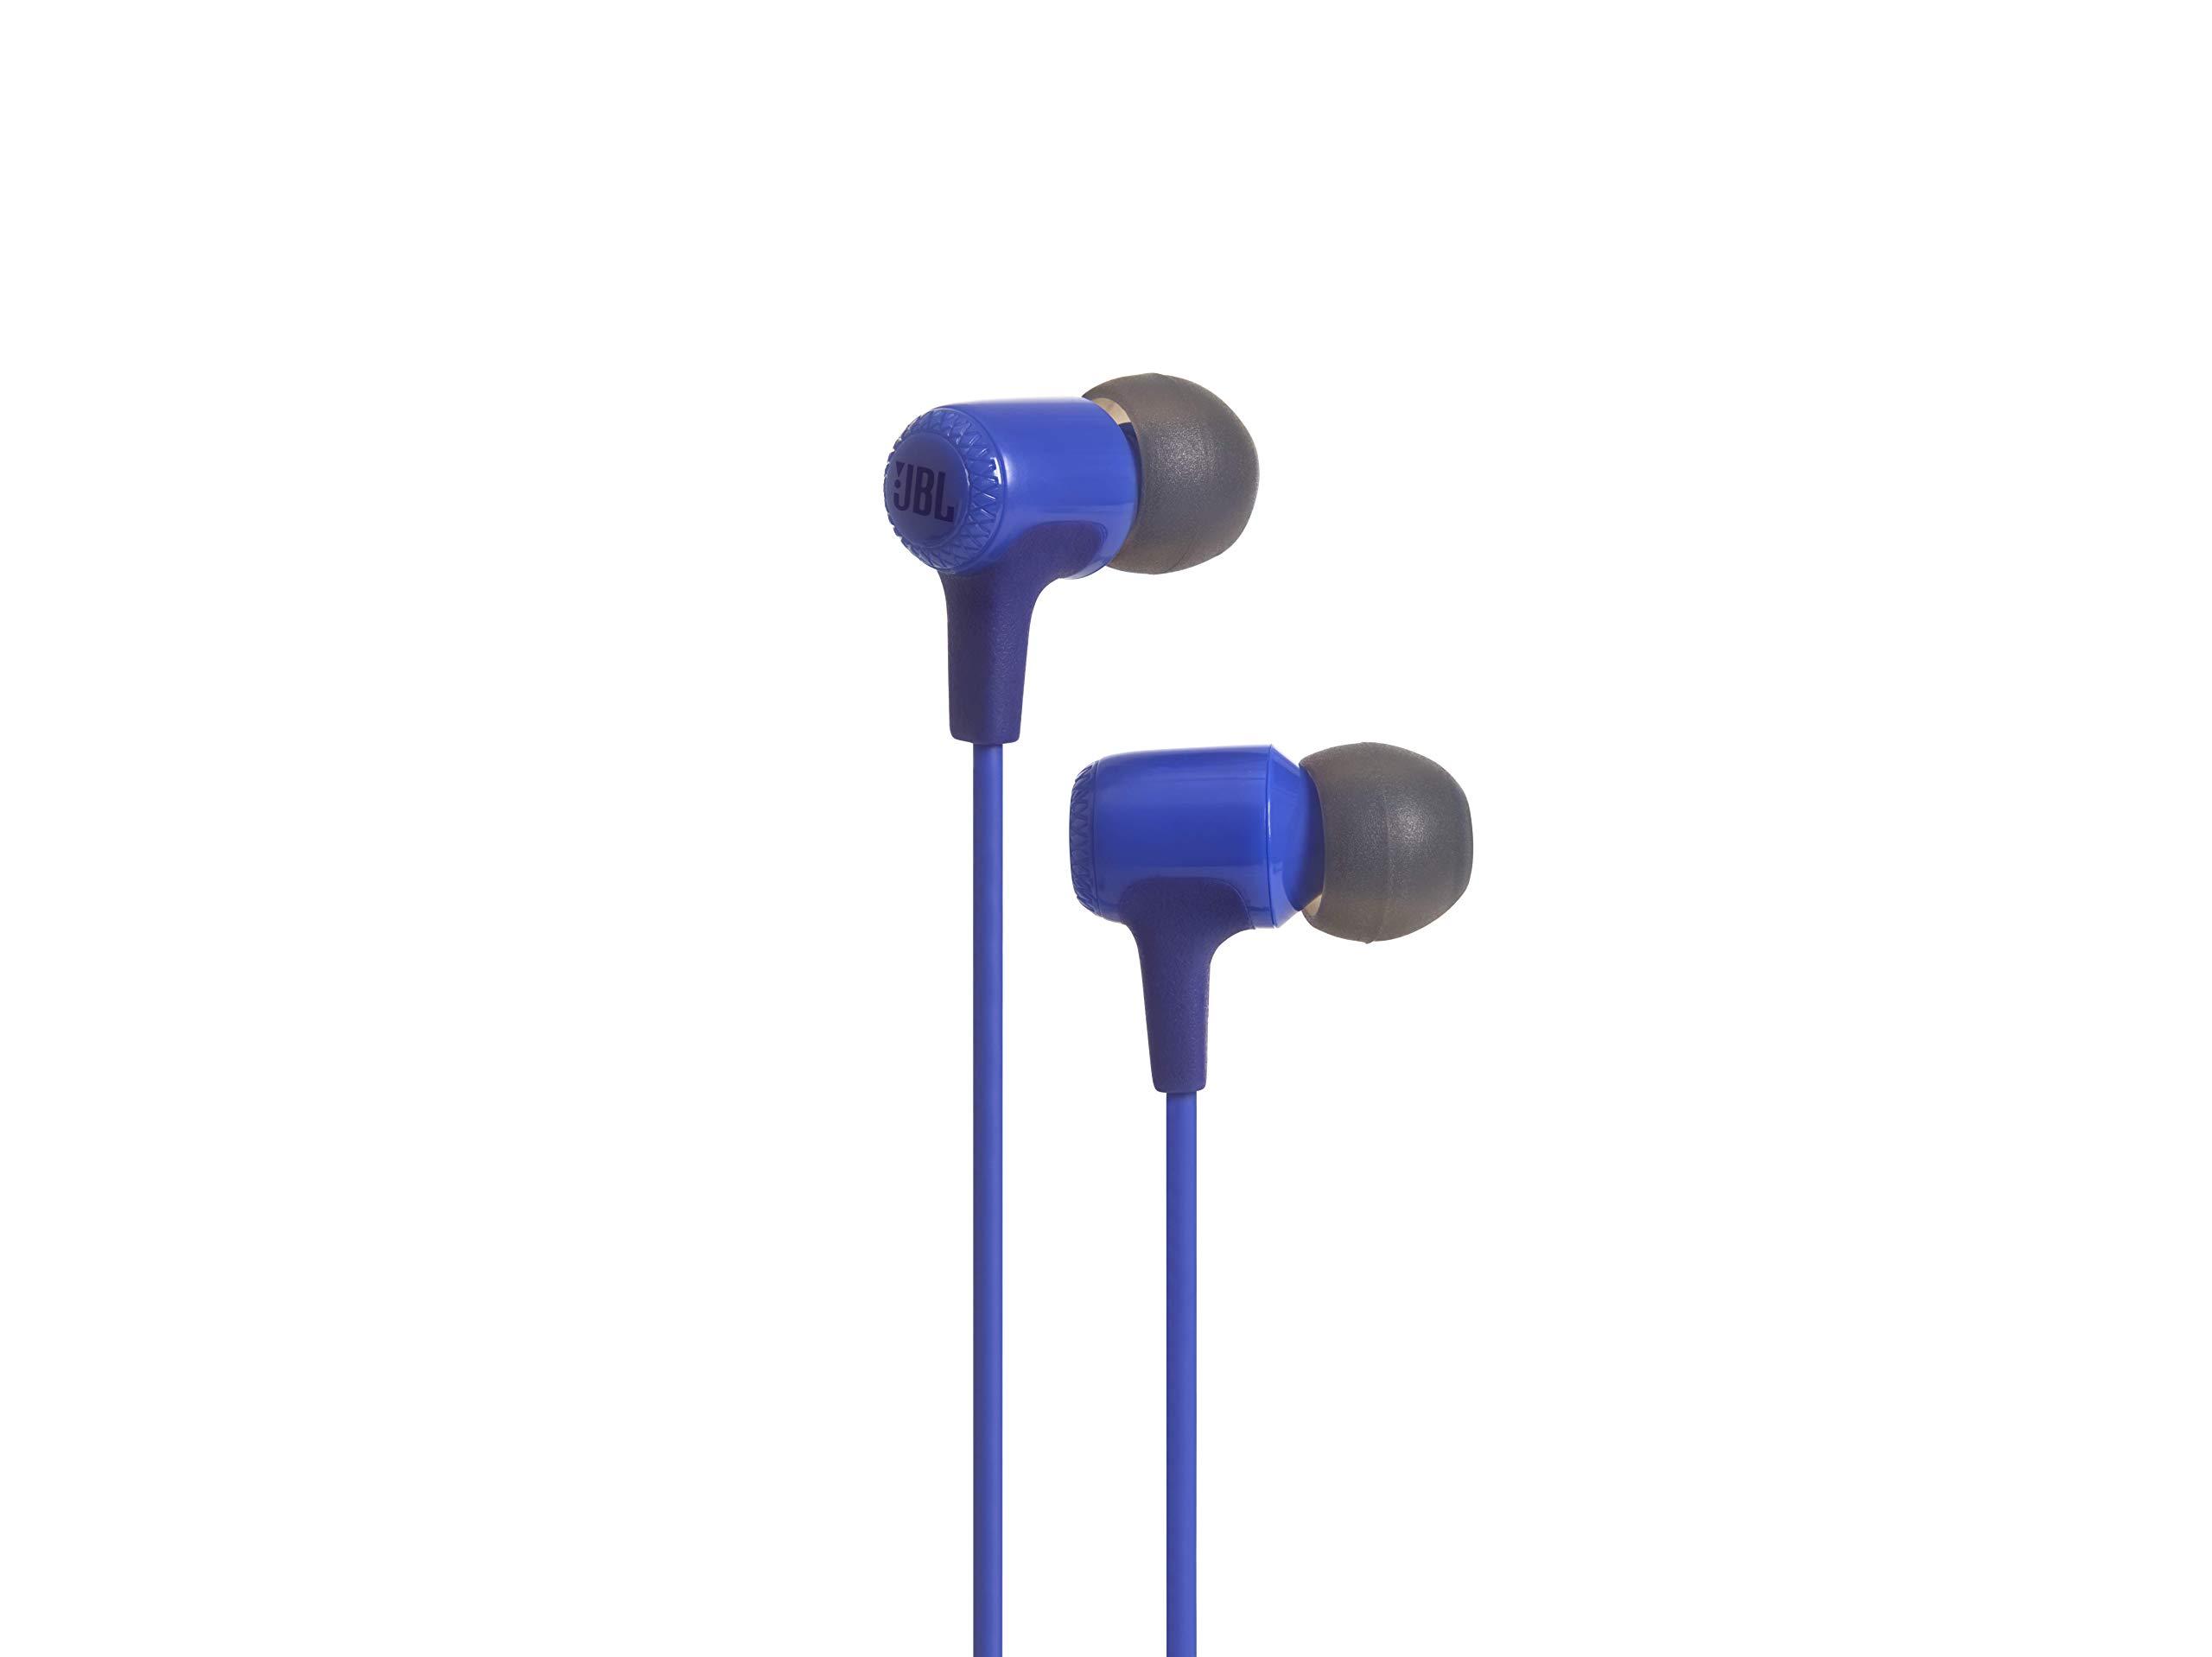 JBL E15 in-Ear Headphones with Mic (Blue)